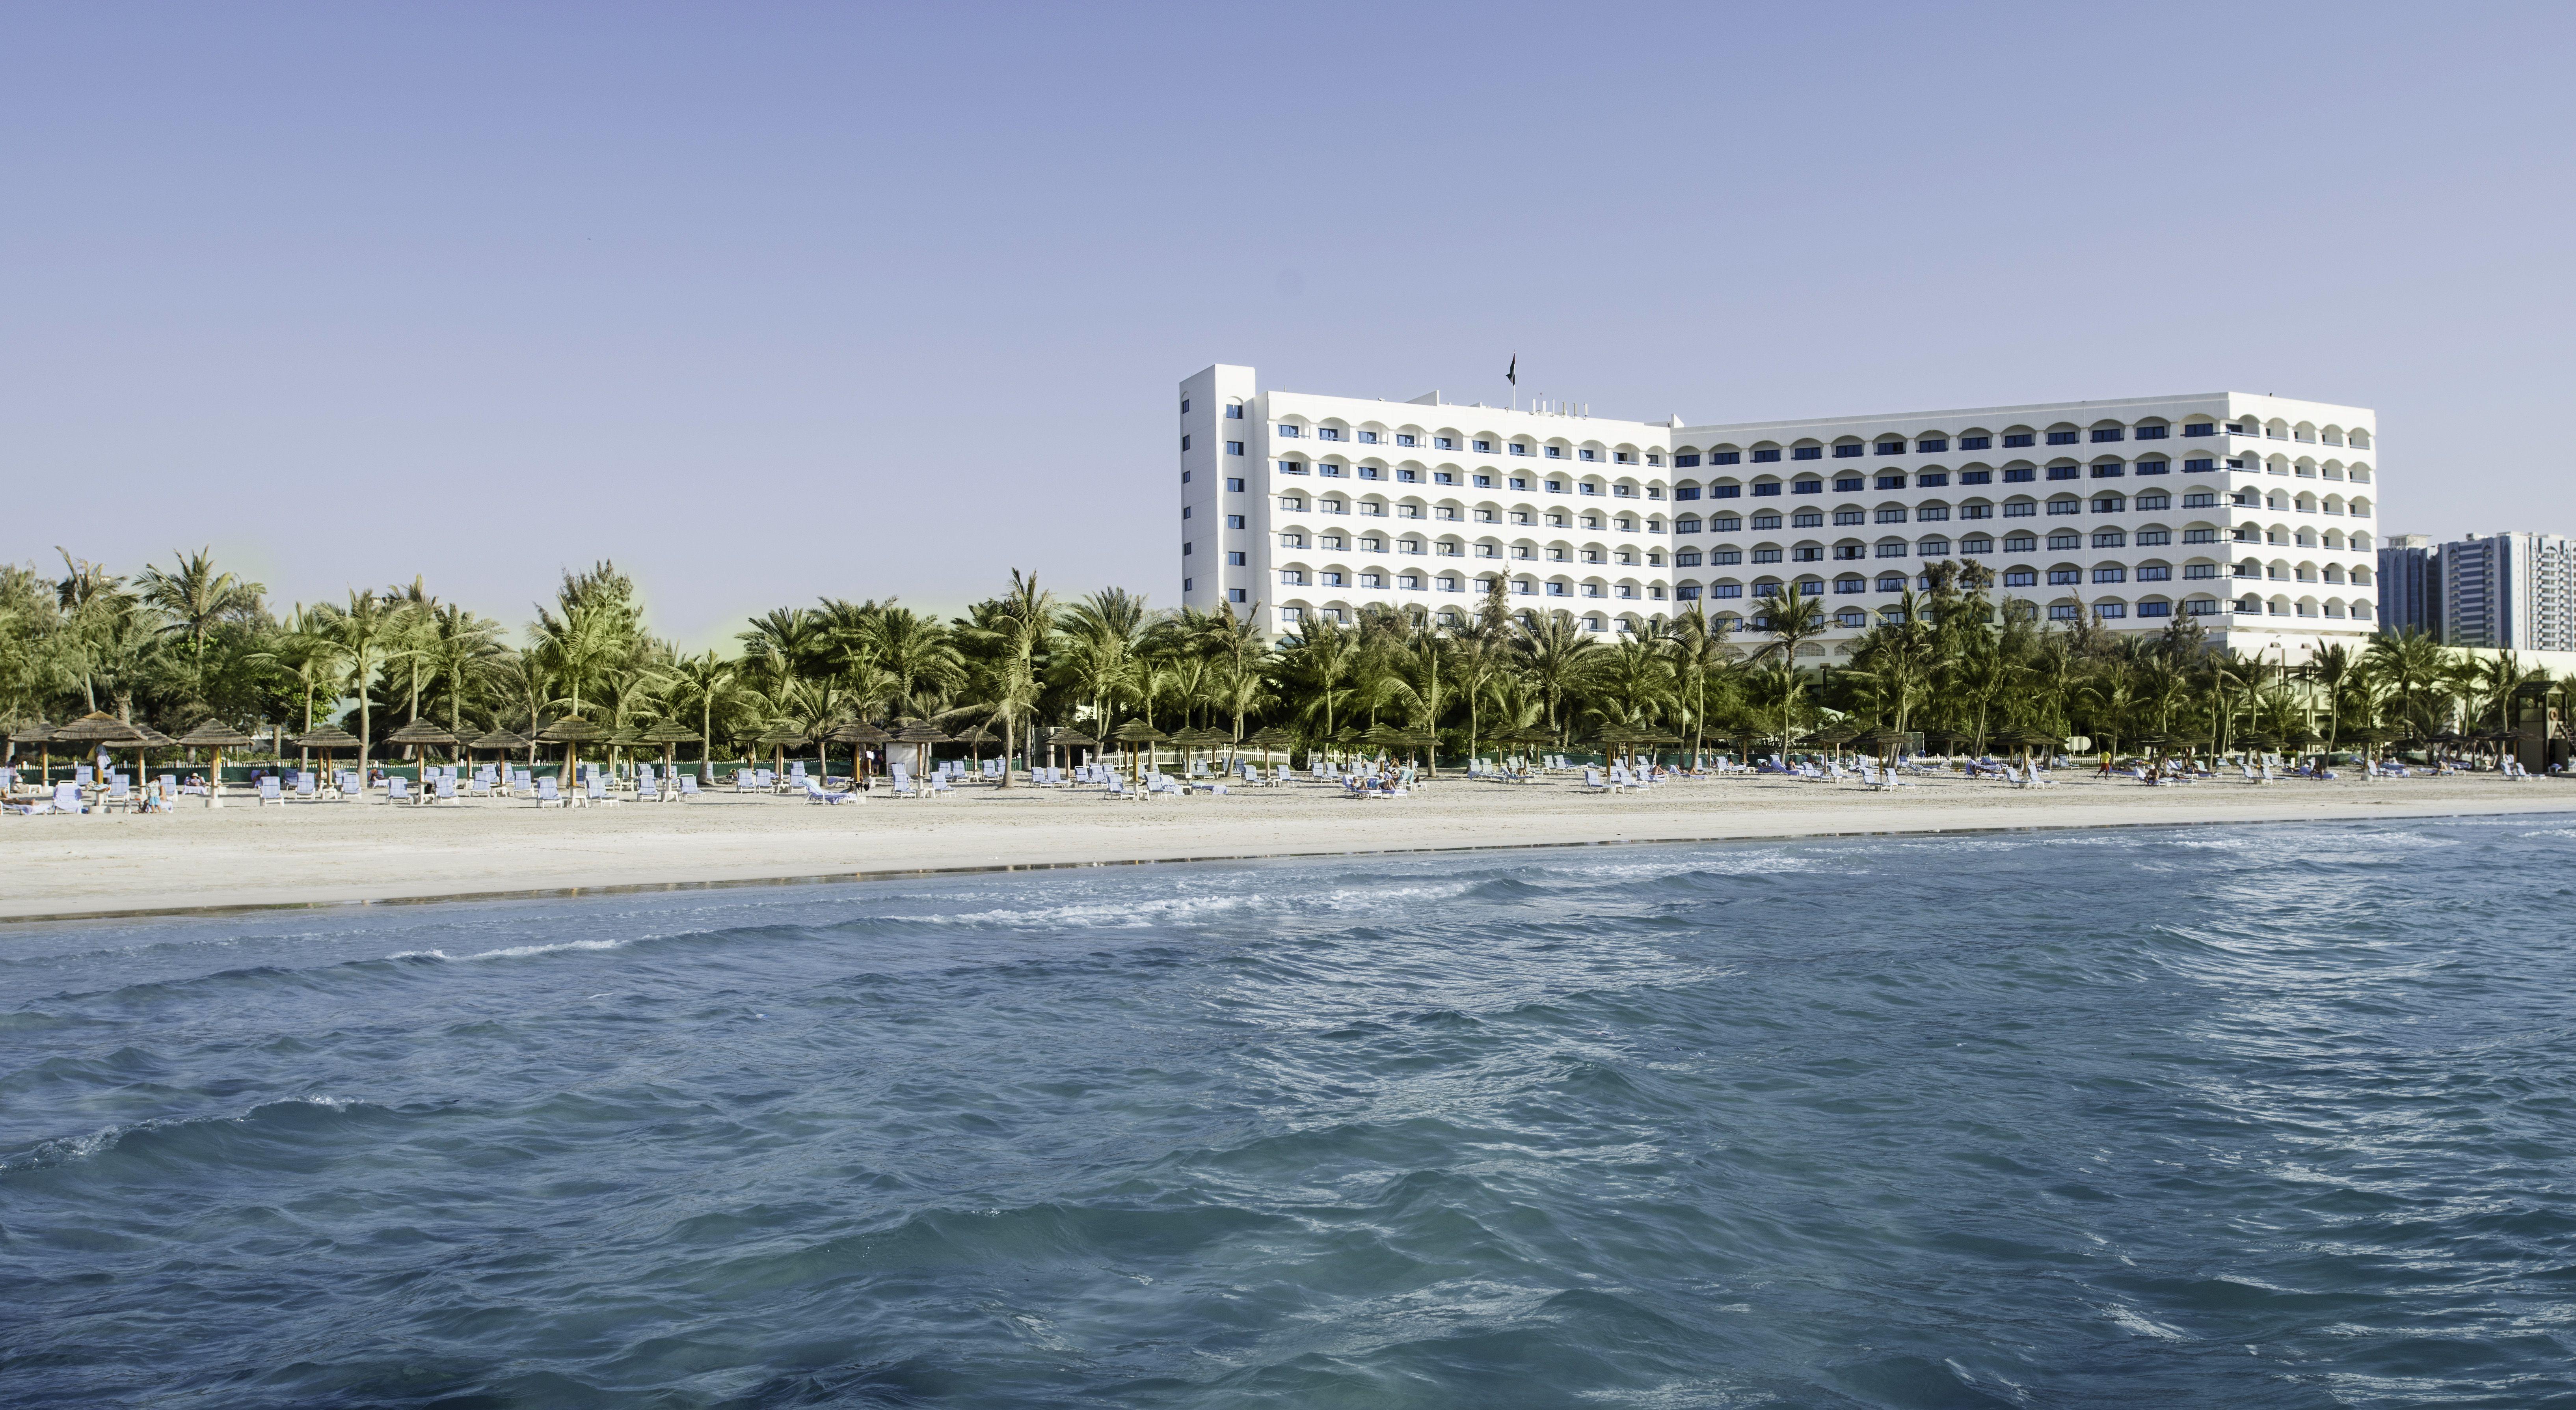 Kempinski Hotel Ajman Gears Up For the Biggest Holi in the UAE